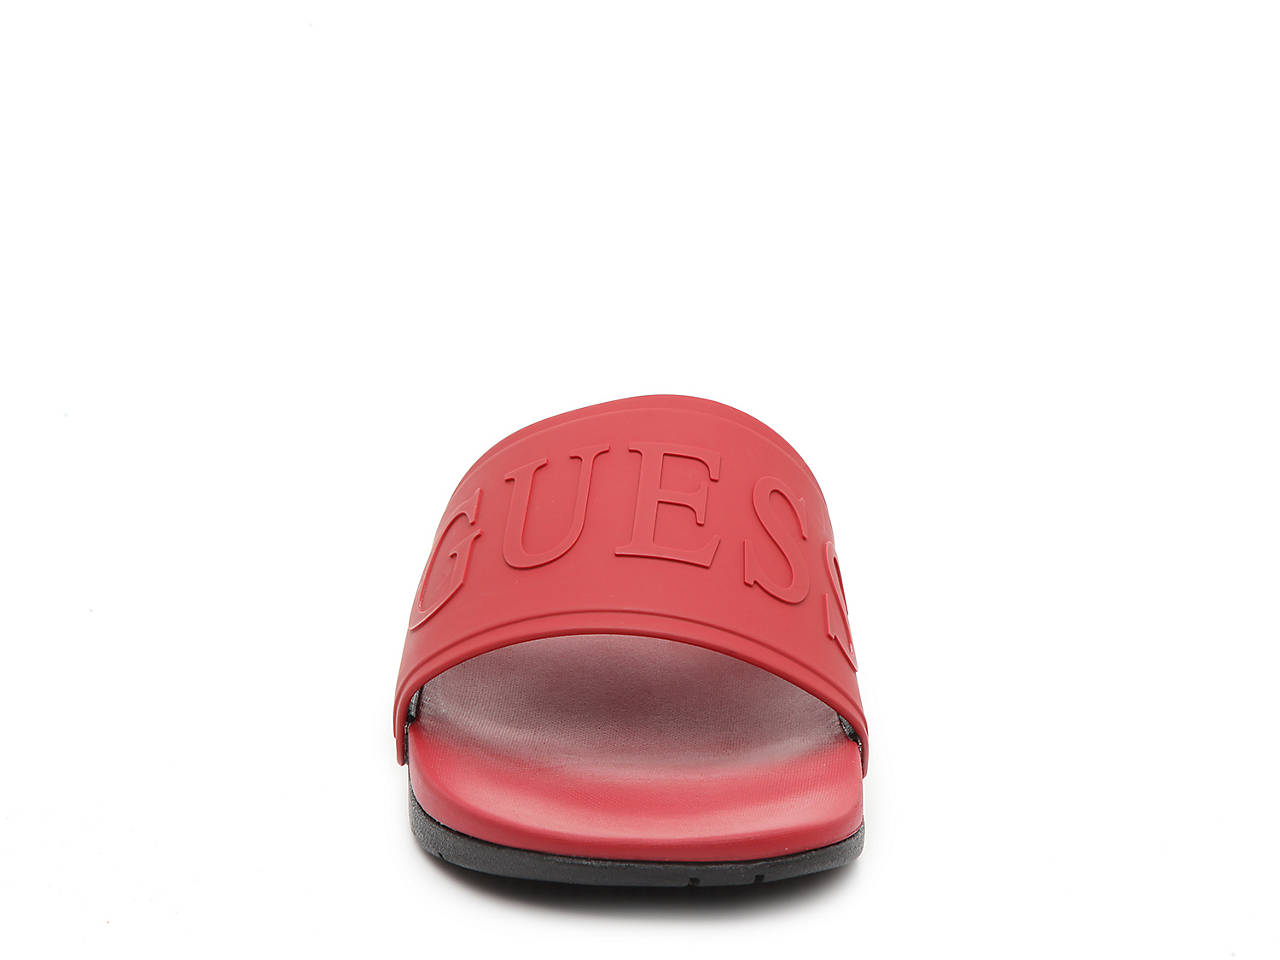 05f34e9e3e67 Guess Gmdelfino Slide Sandal - Men s Men s Shoes